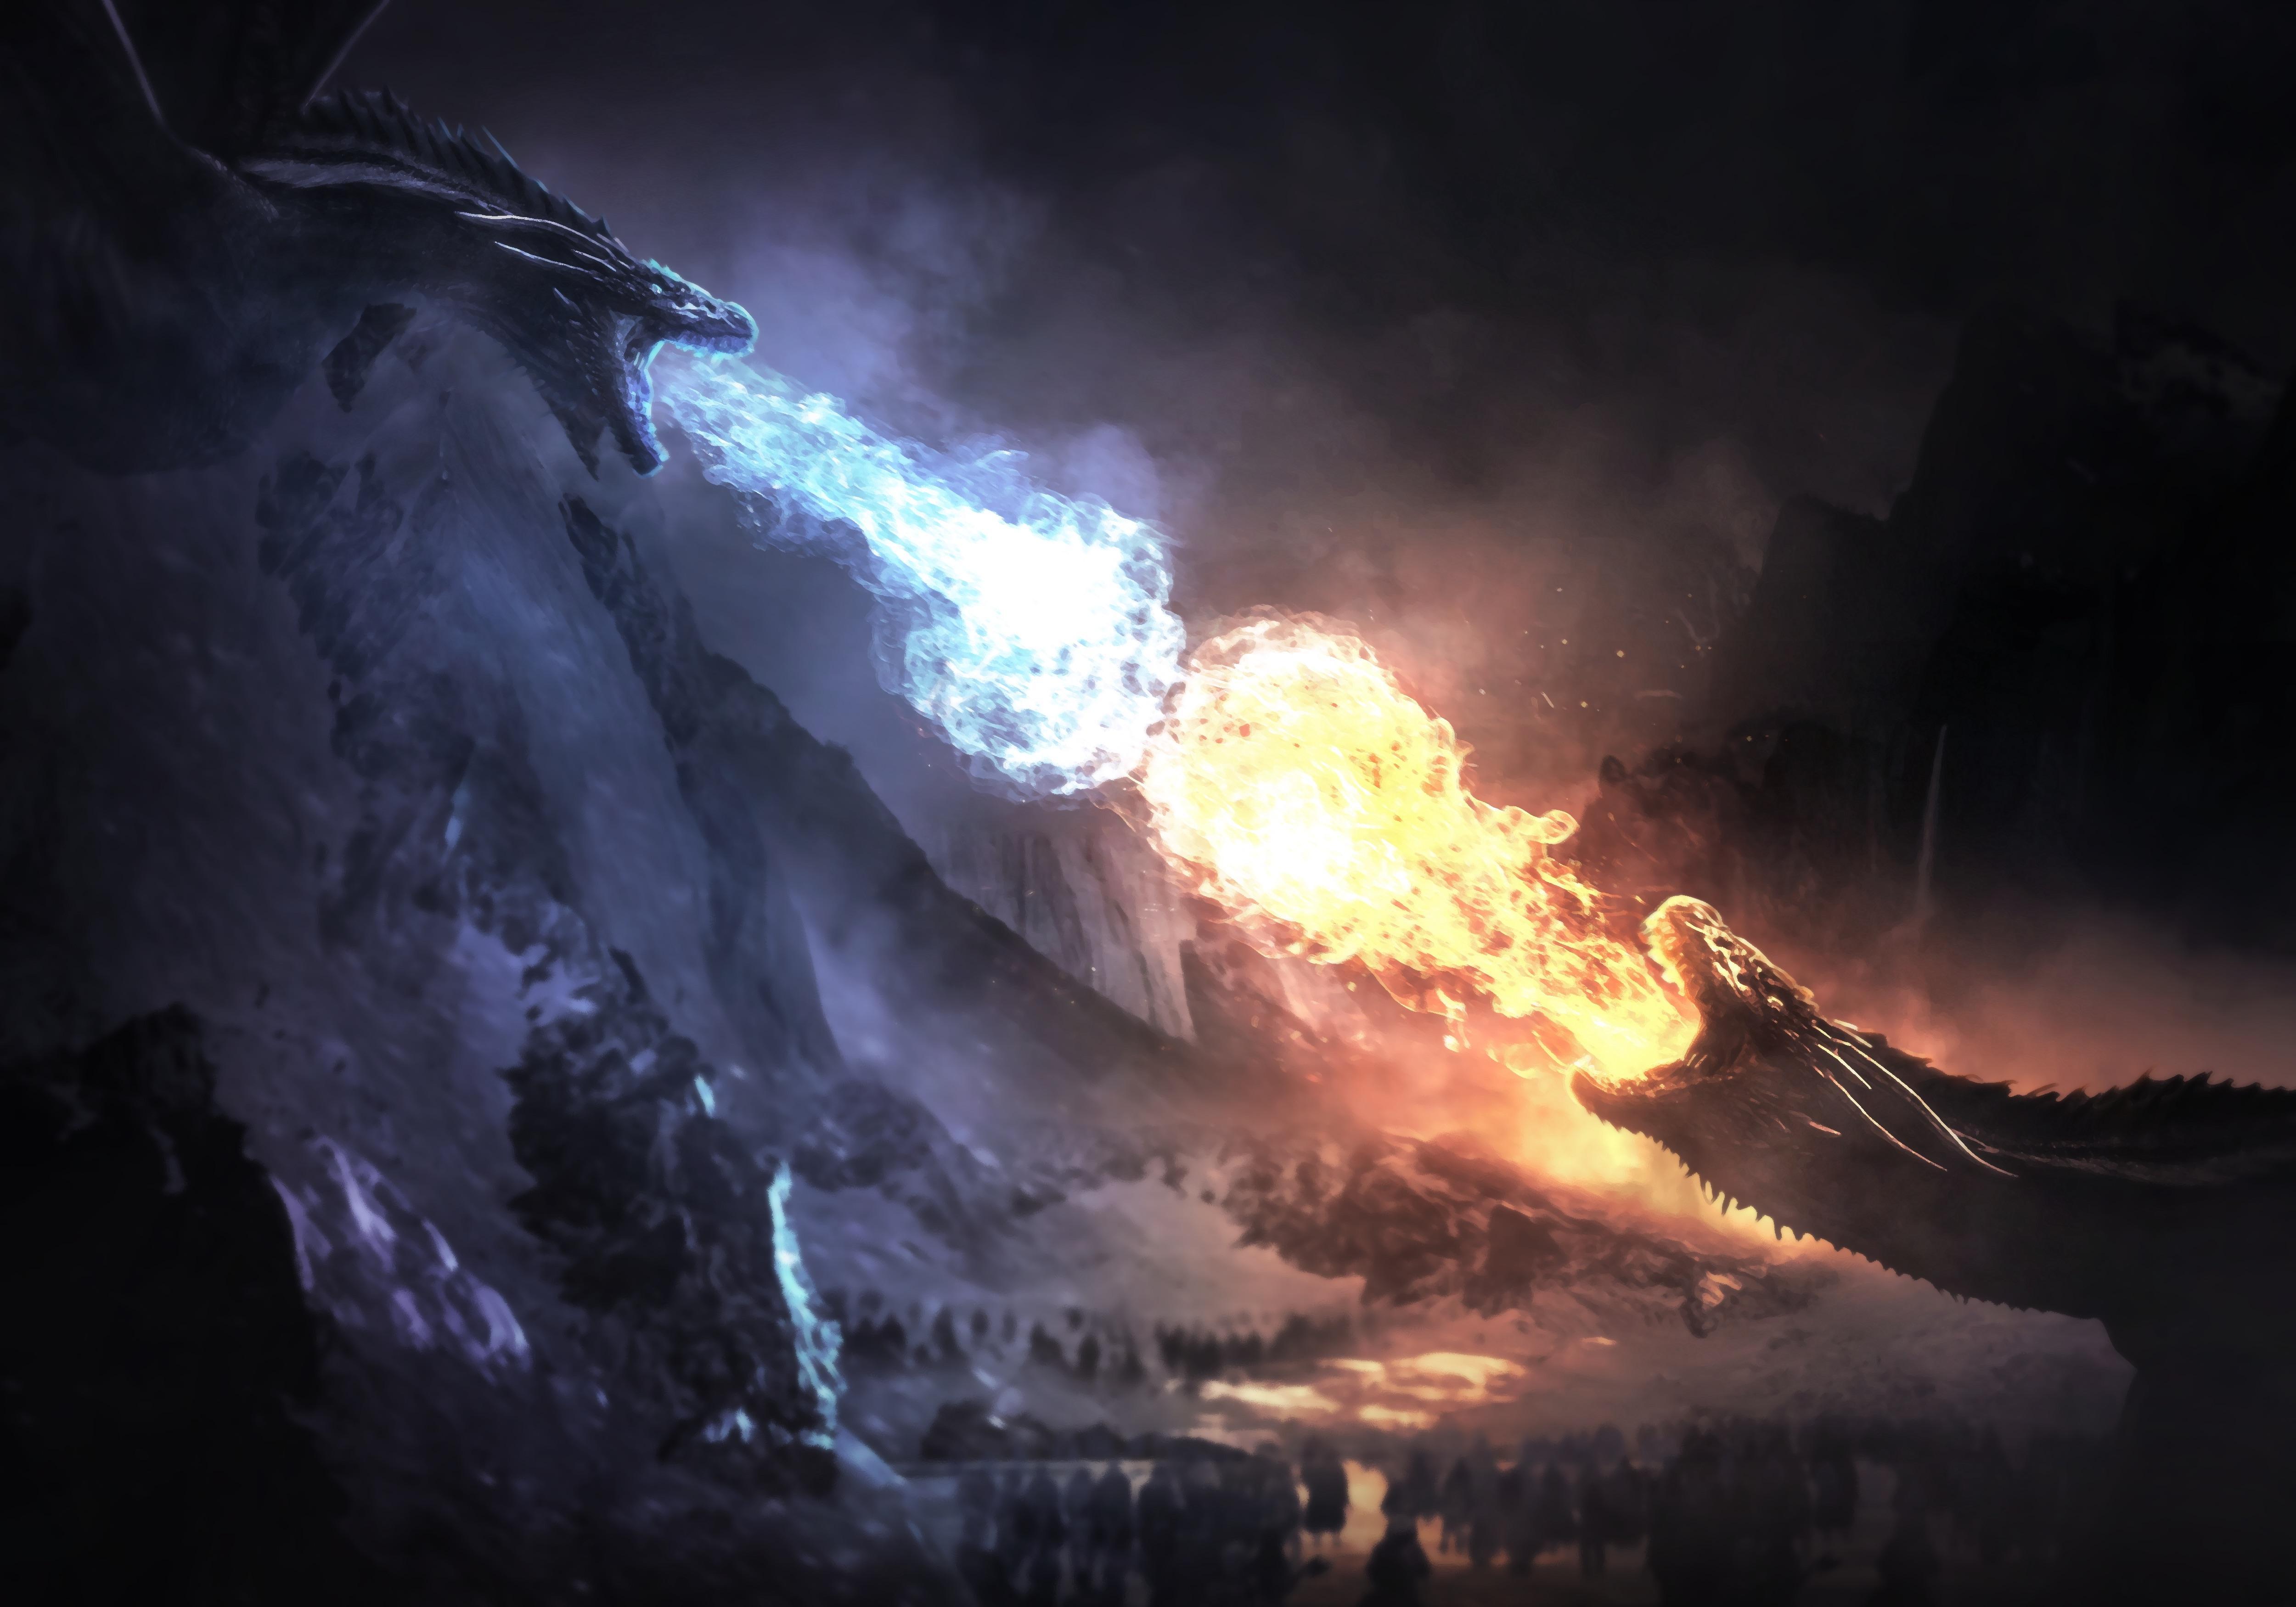 2048x1152 Dragons Fight Game Of Thrones Season 8 2048x1152